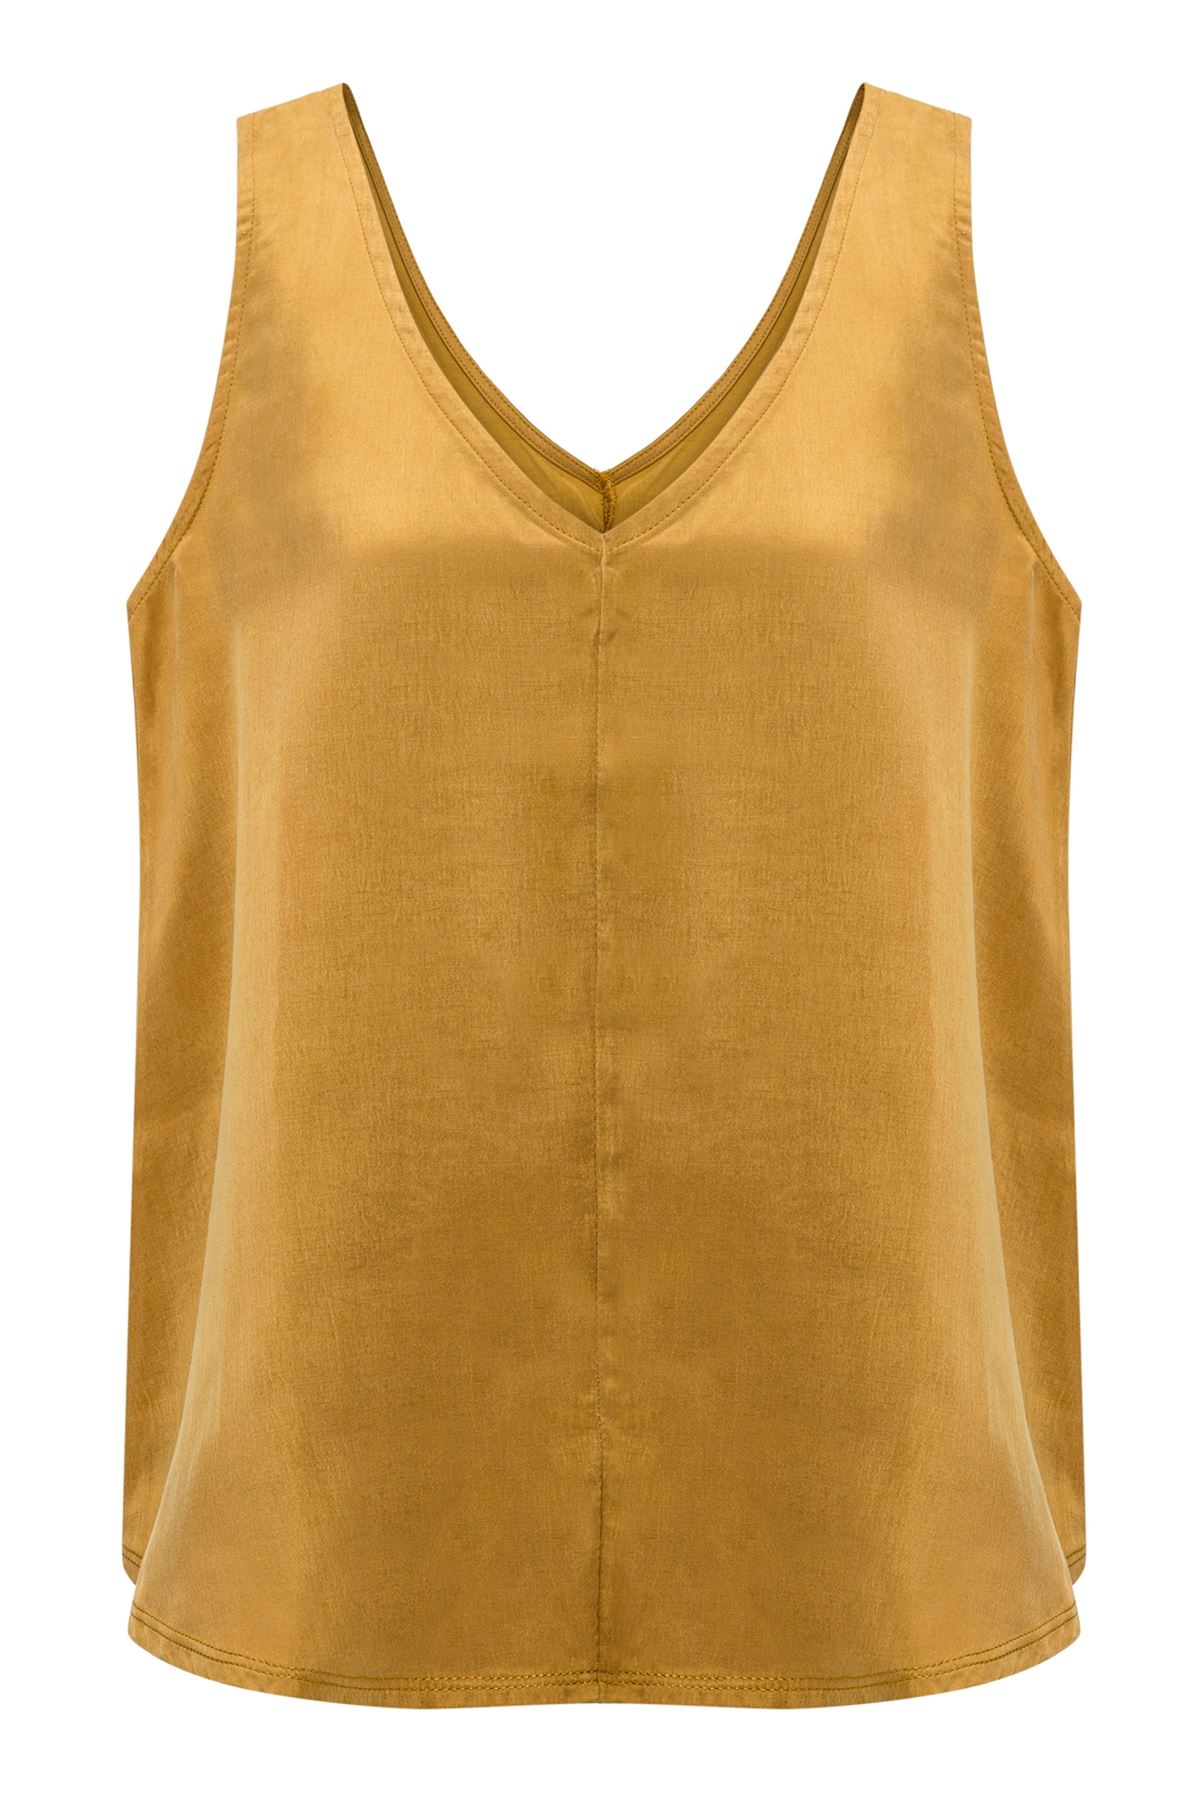 Gold Tanktop